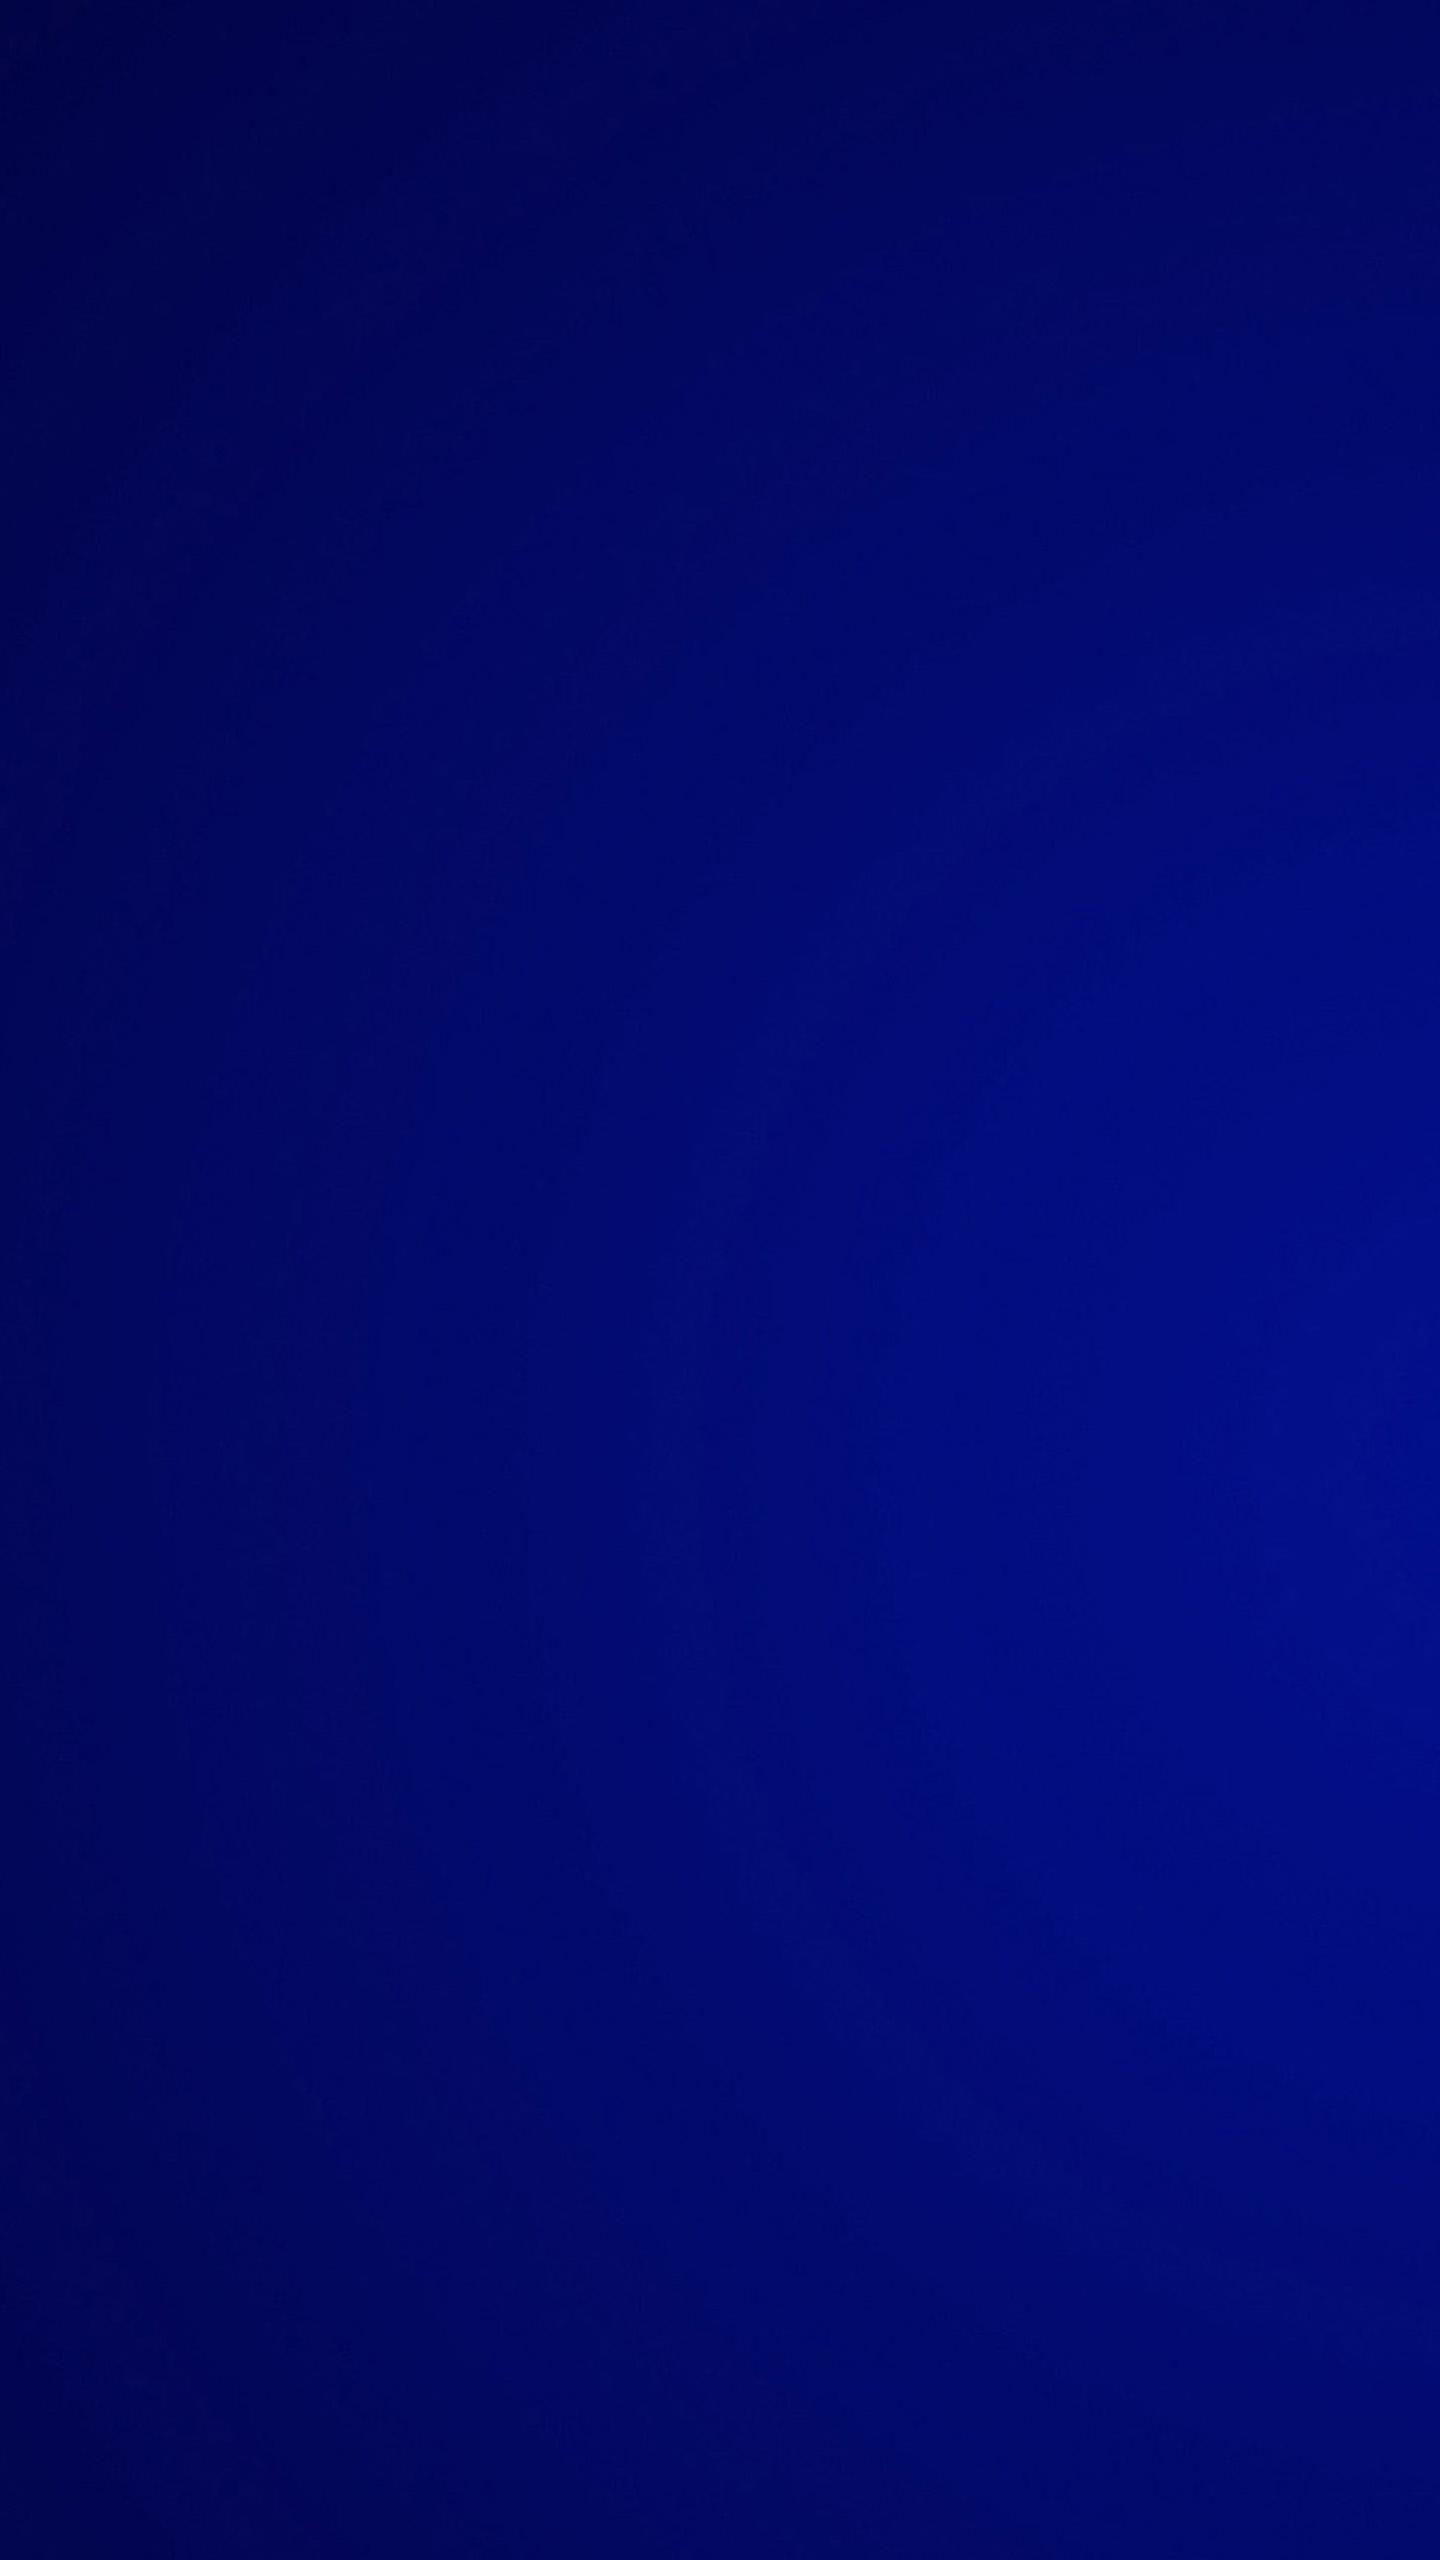 Minimalism Background Samsung Galaxy S6 Wallpapers 142 1440x2560